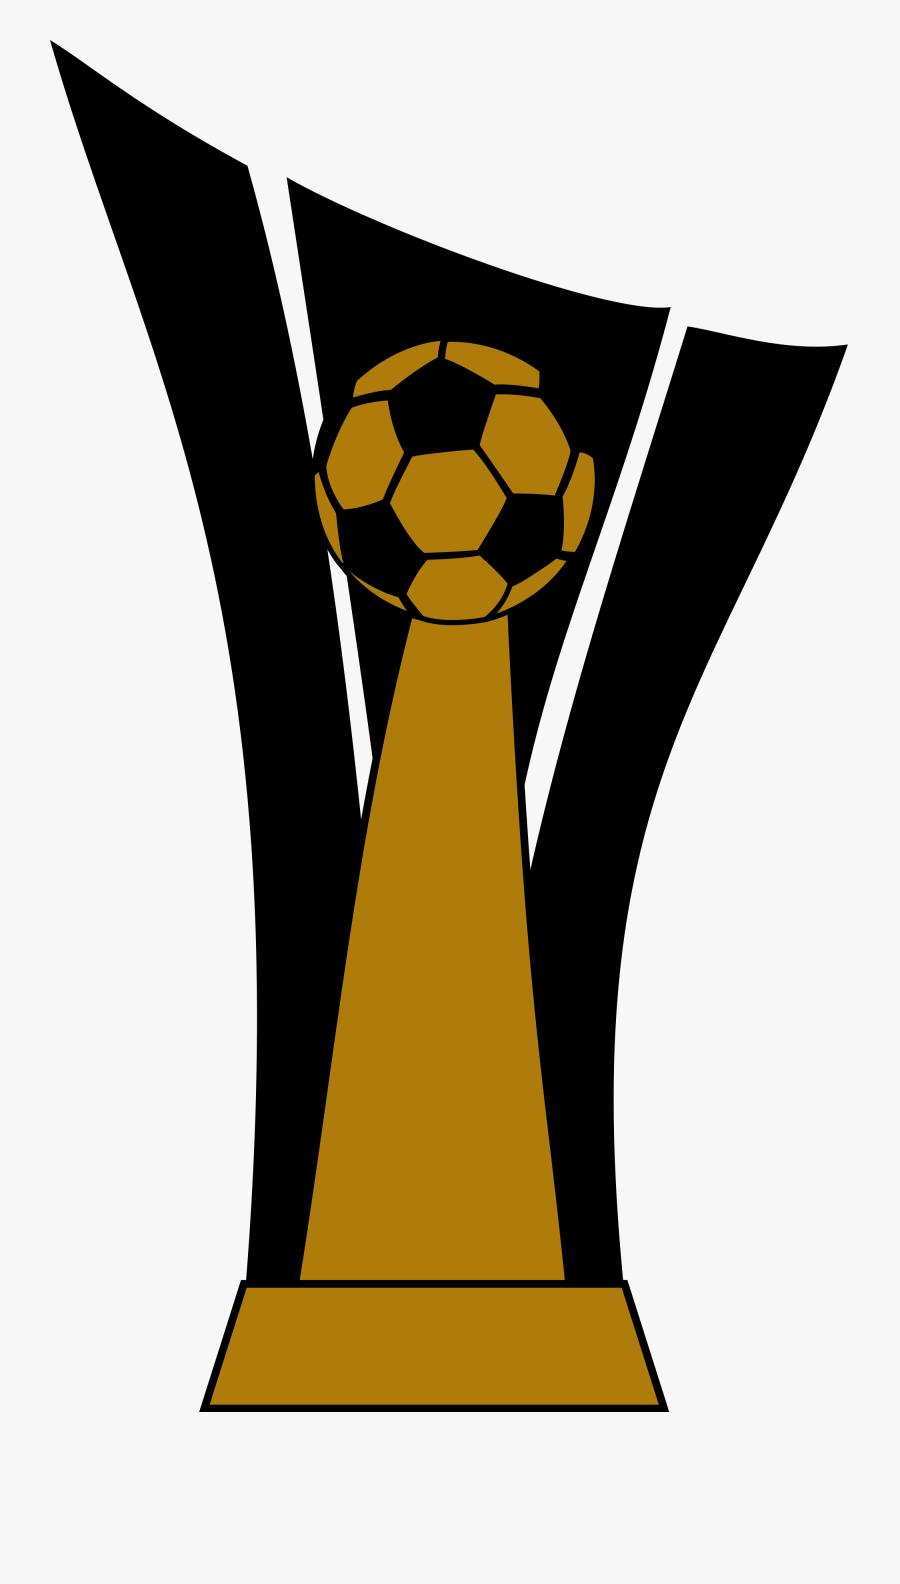 Trophy Clipart Champion - Concacaf Liga De Campeones Png, Transparent Clipart